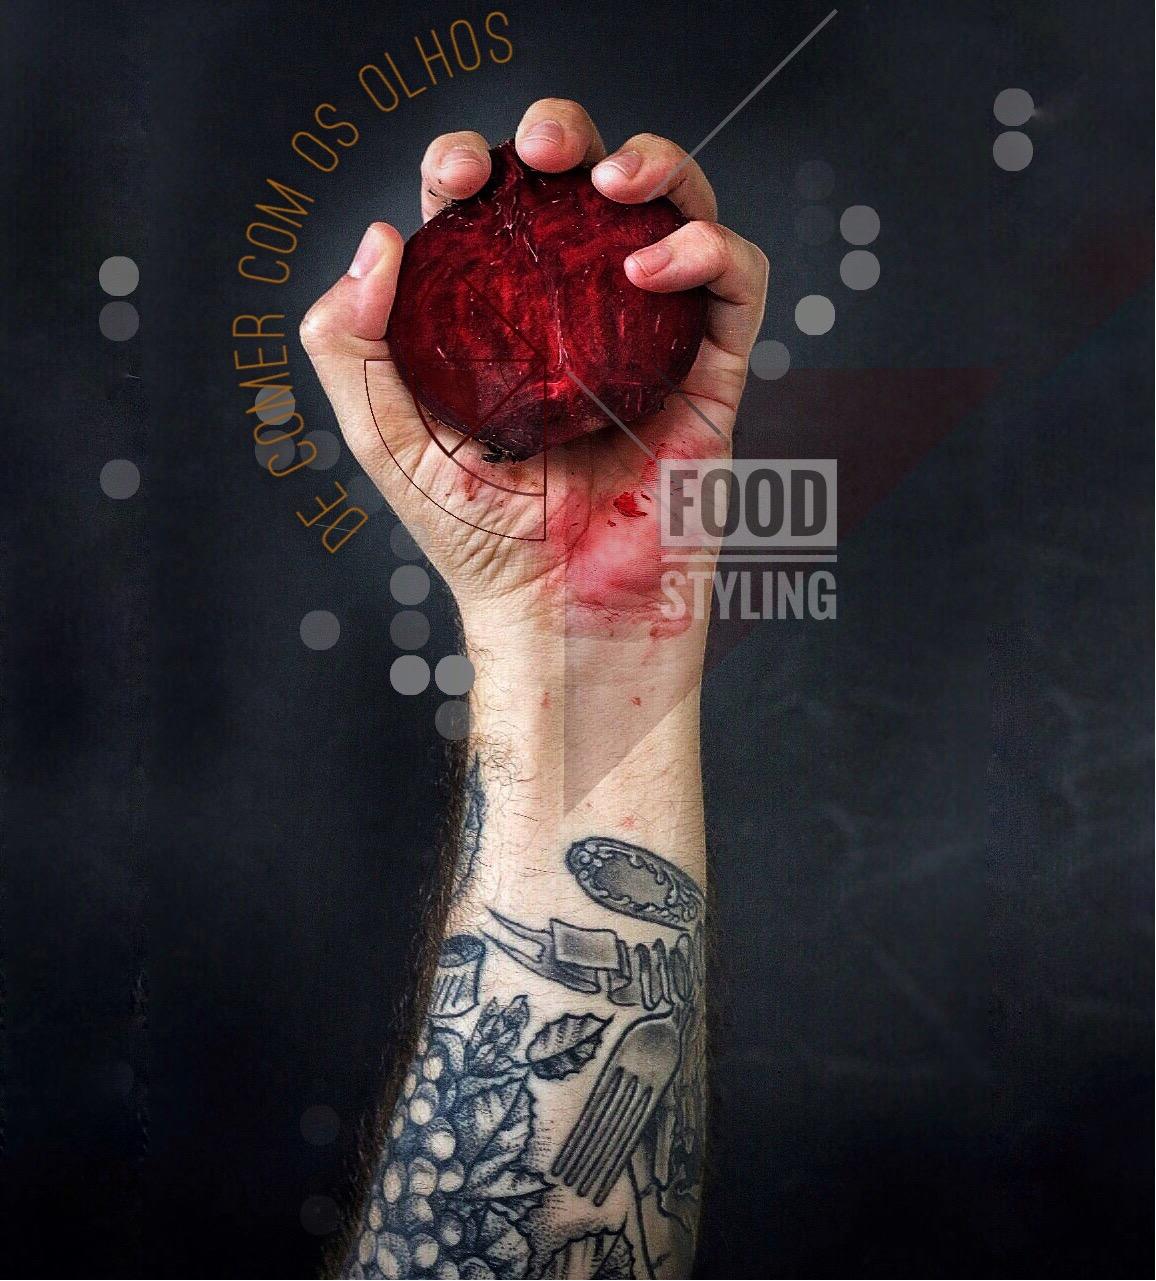 Food Styling & Sustentabilidade